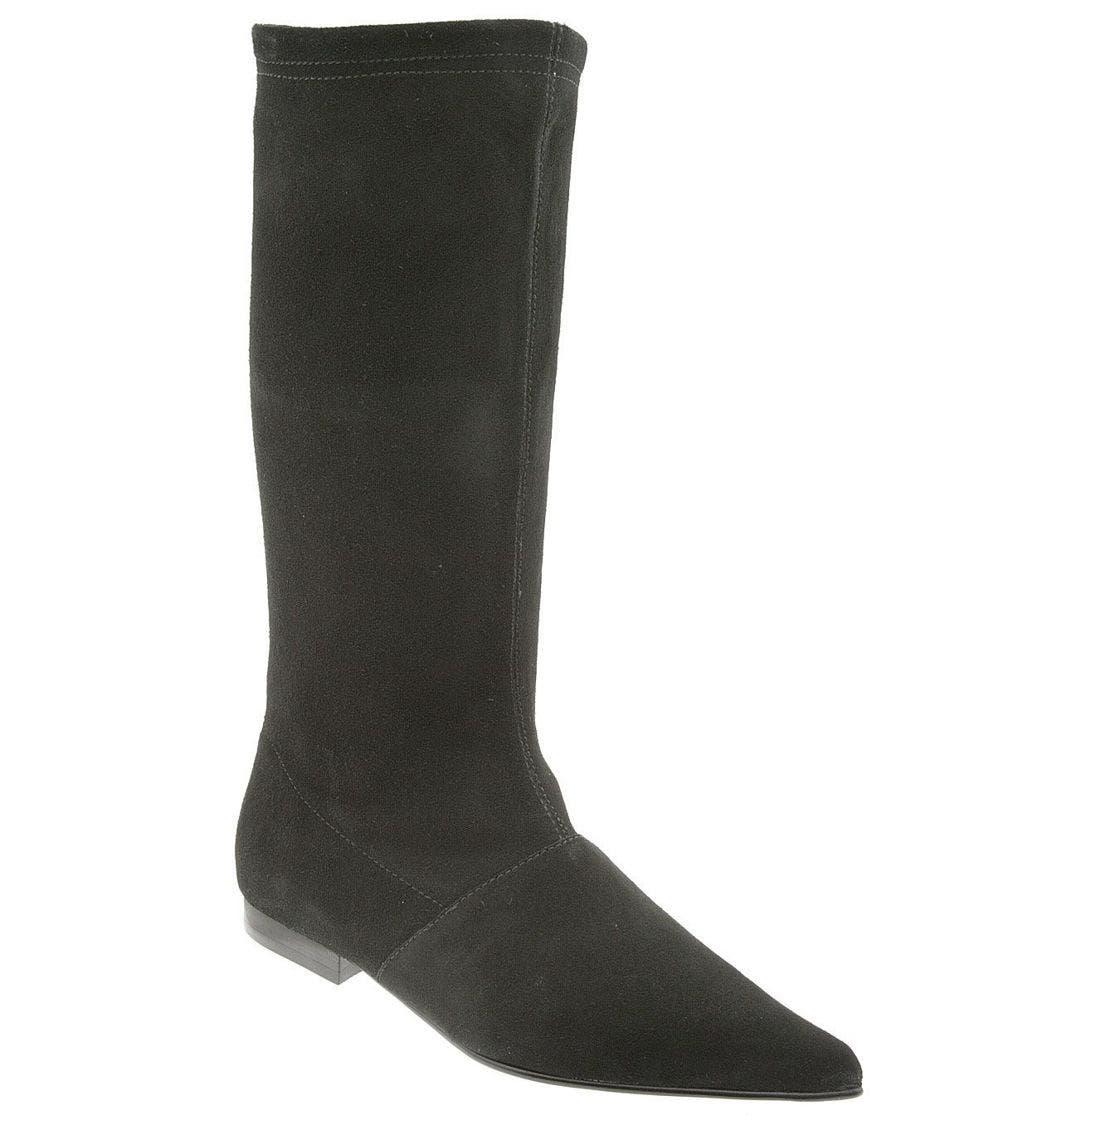 STEVE MADDEN 'Lillian Flat' Boot, Main, color, BLK